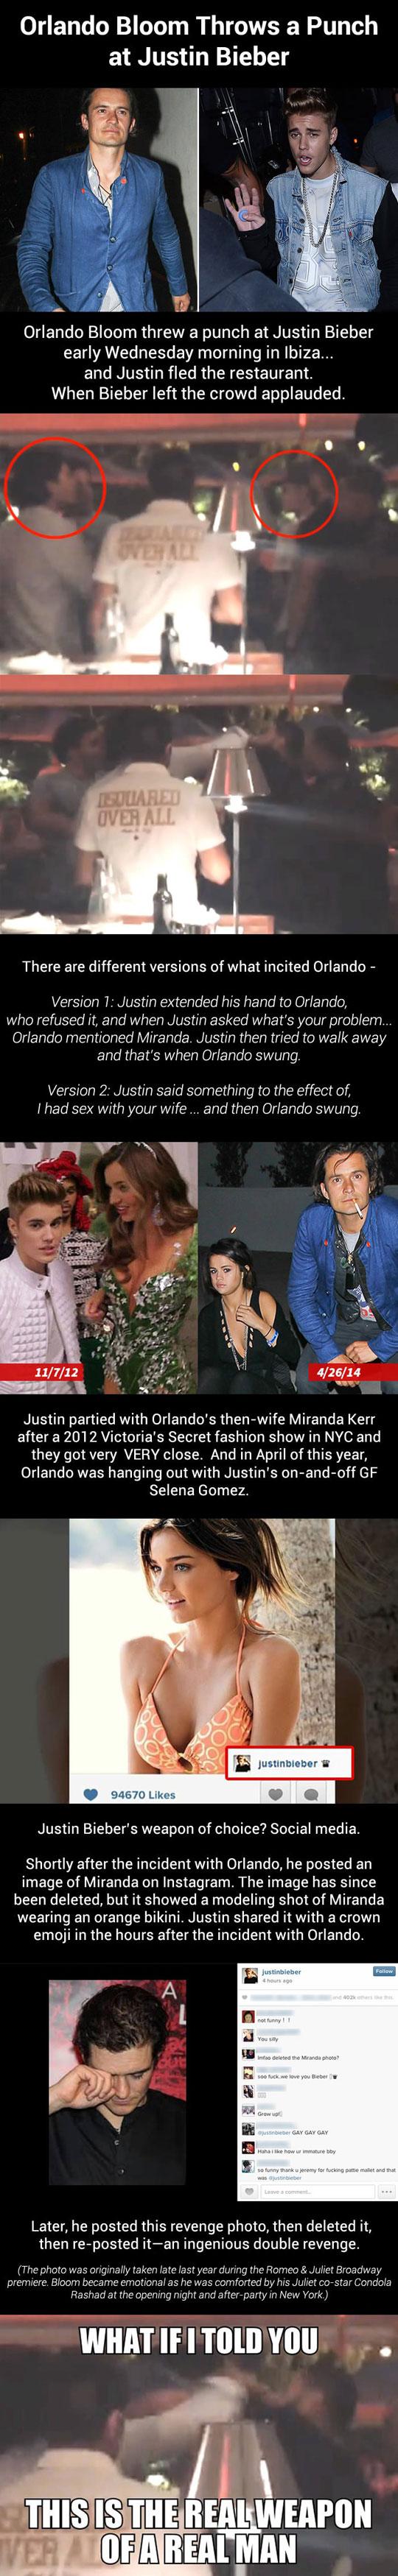 The Orlando Bloom- Bieber Theory